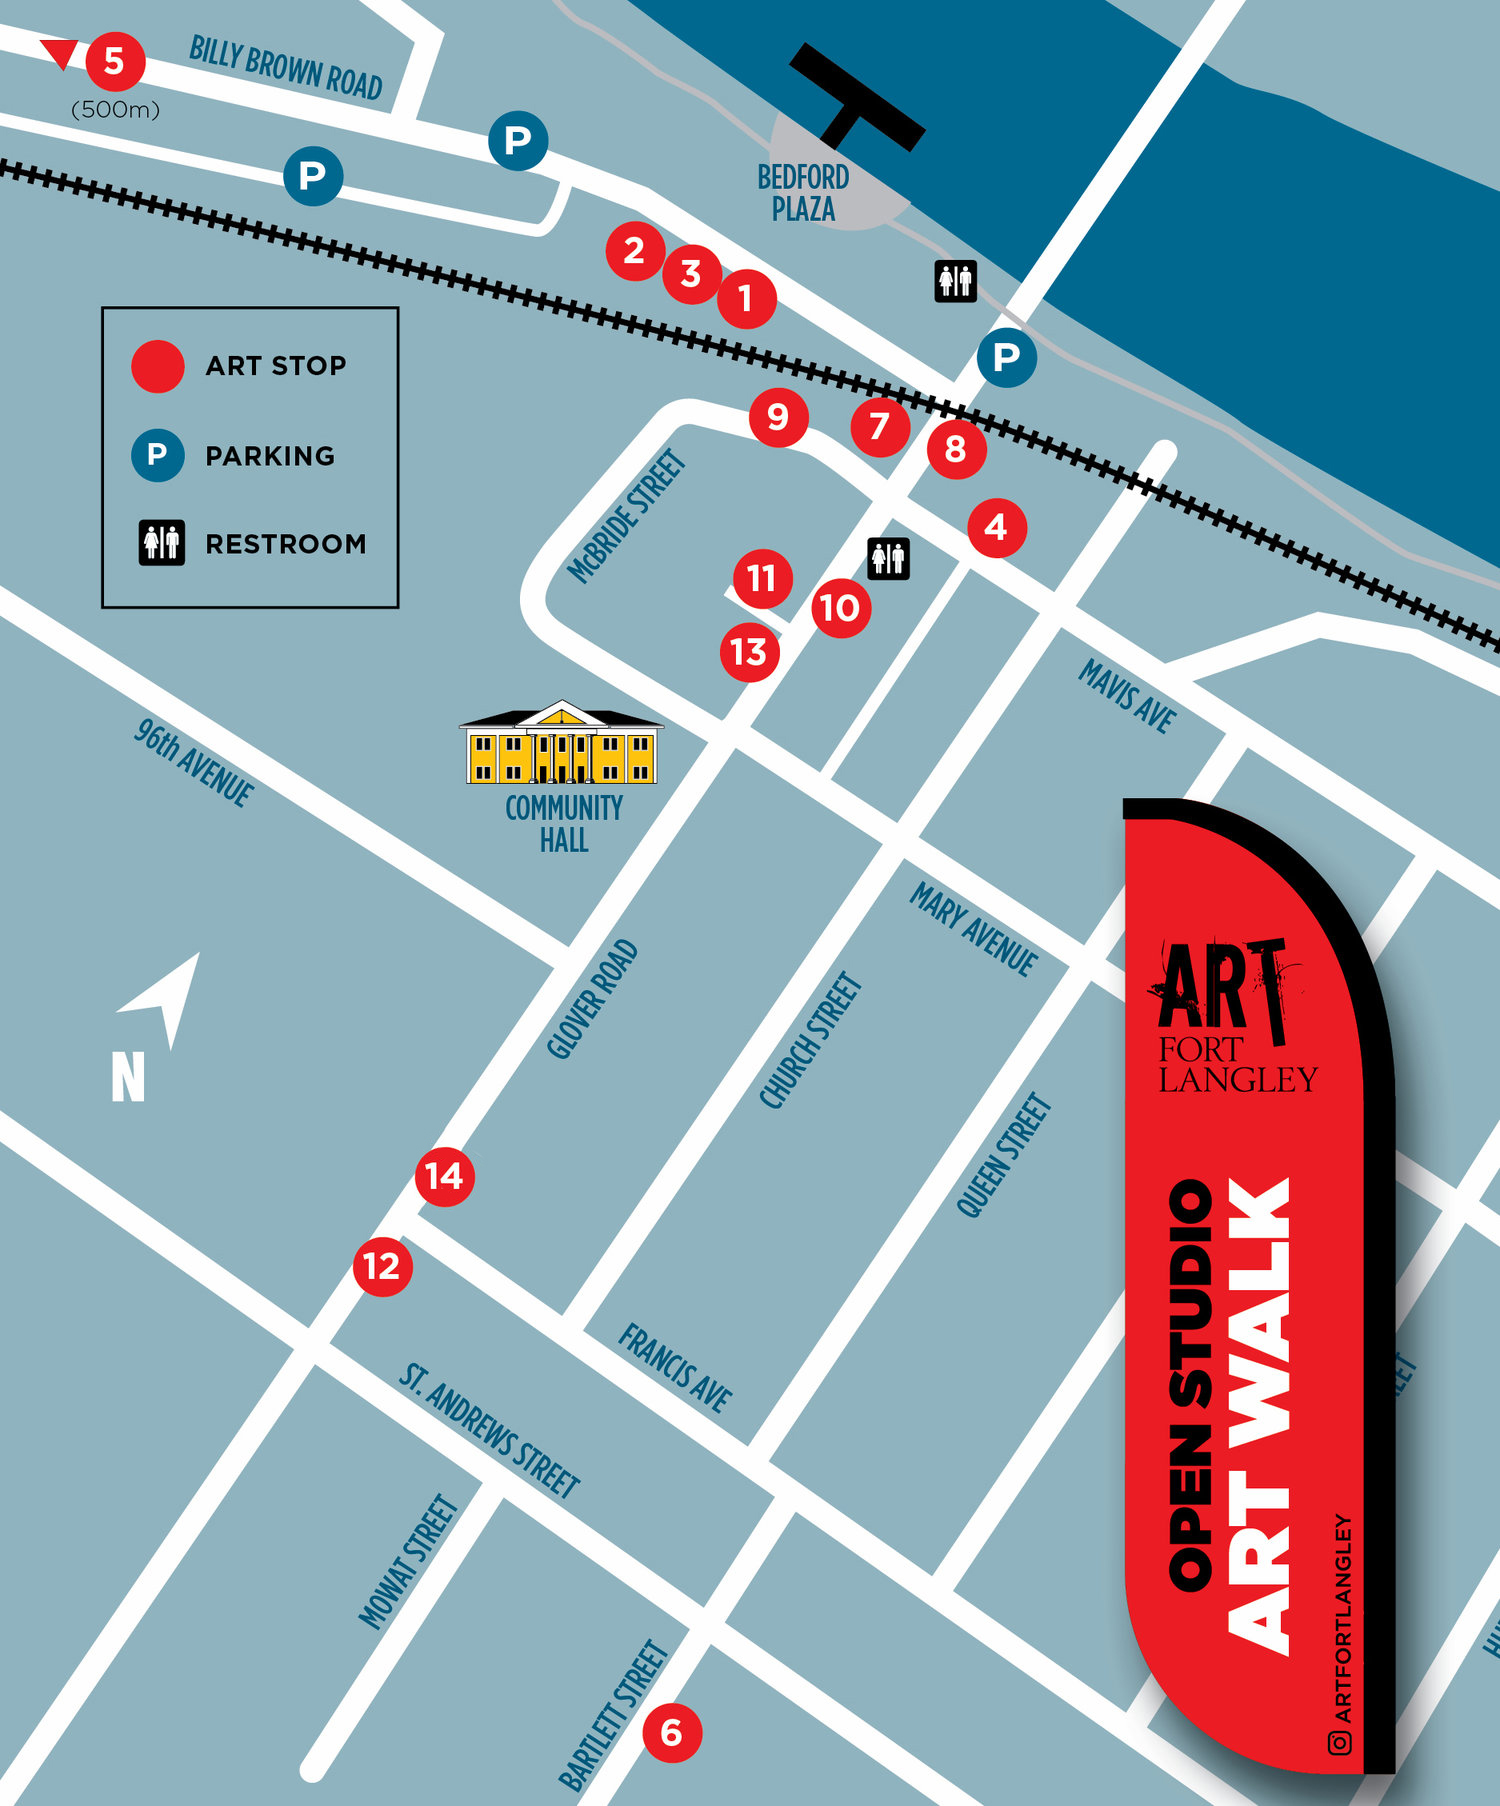 FL+JAZZ+ARTWALK+web+map.jpg